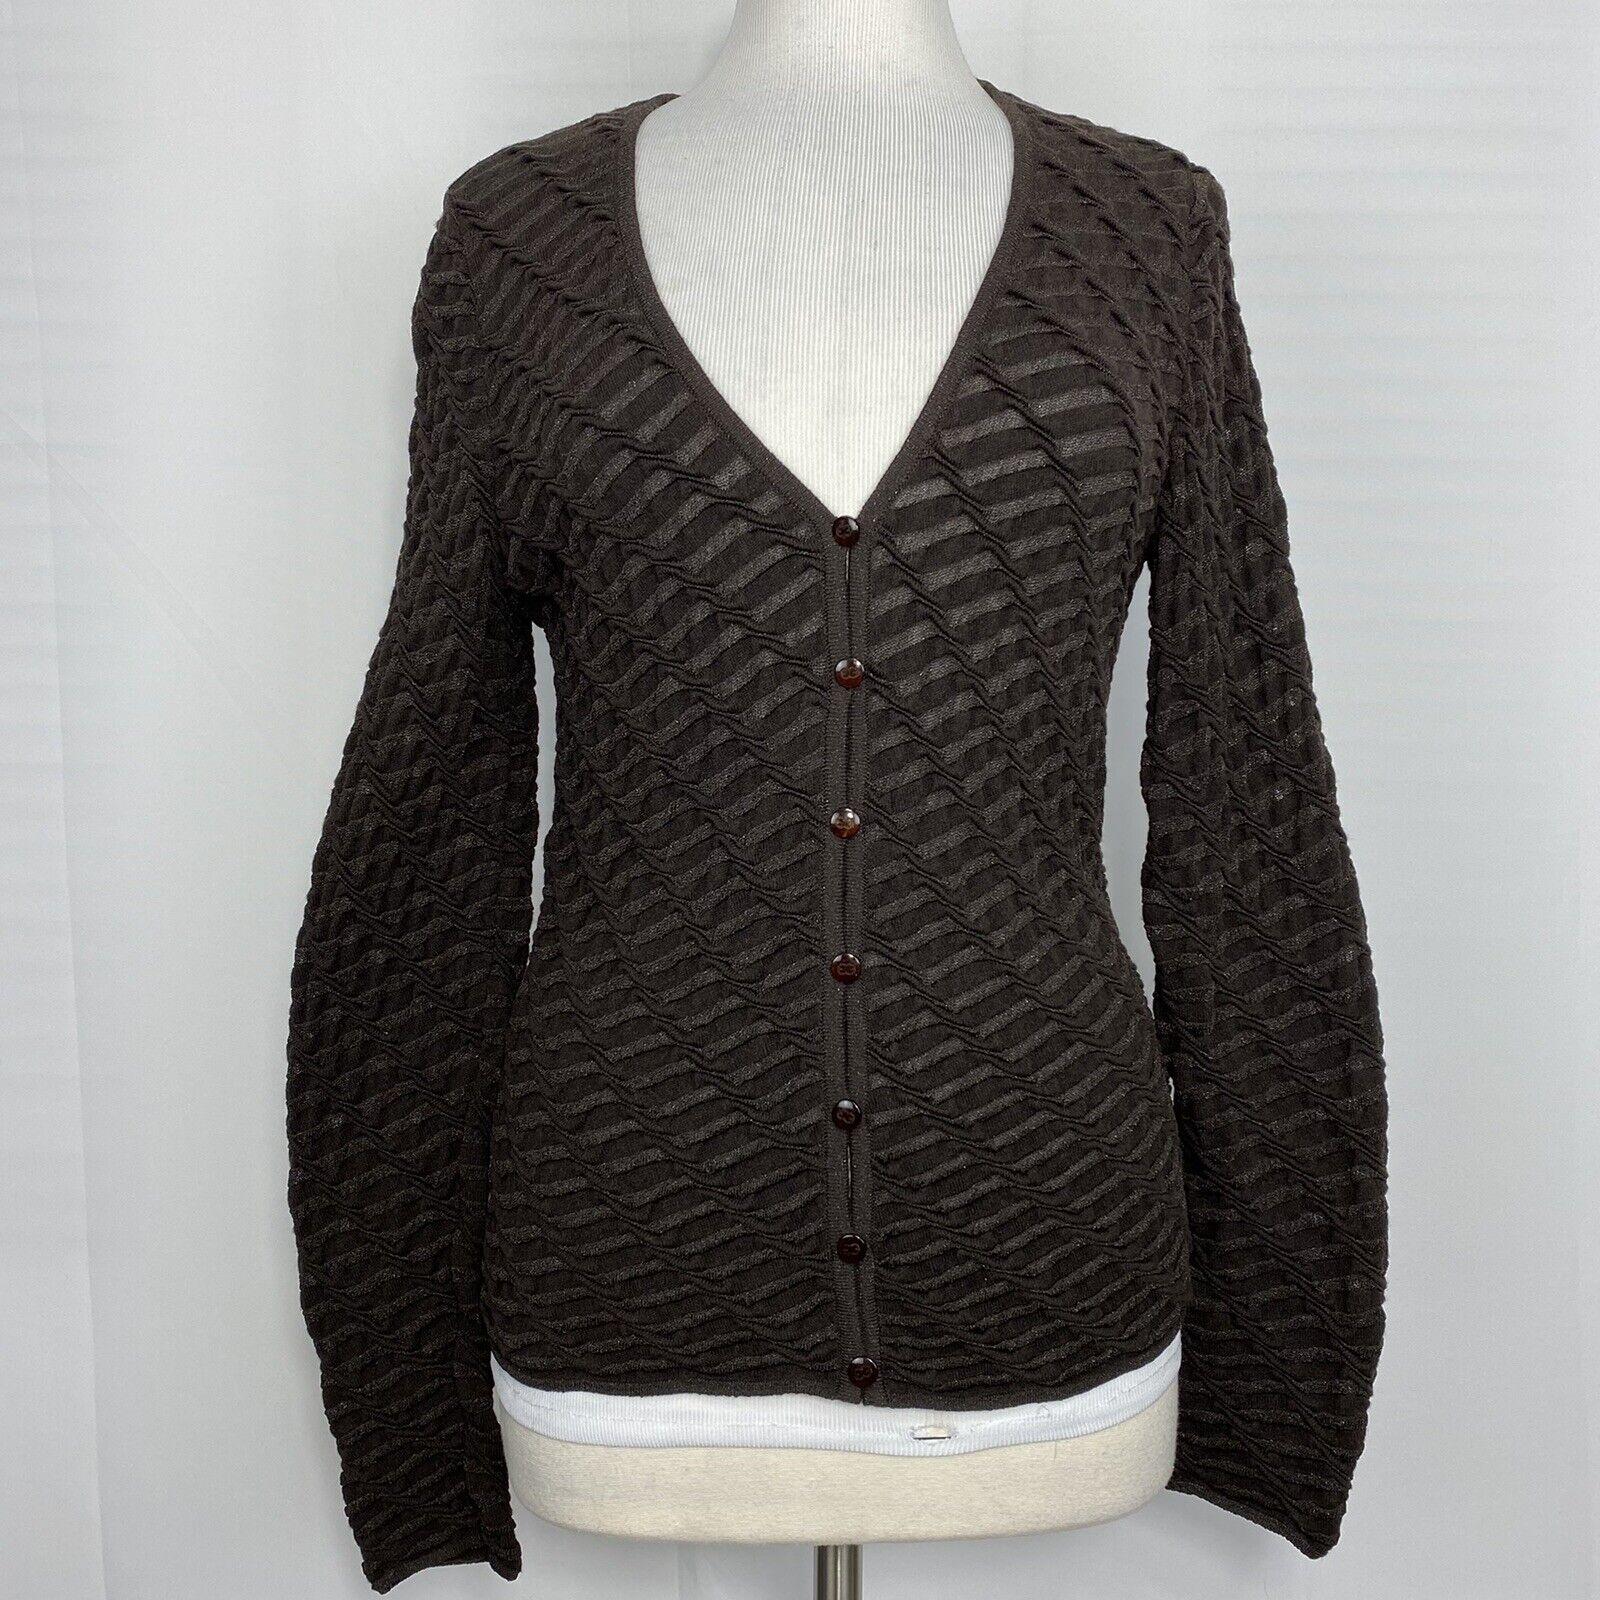 Vtg Escada 36 S/M Cardigan Sweater Wool Silk Cashmere Brown Sheen Germany #SS